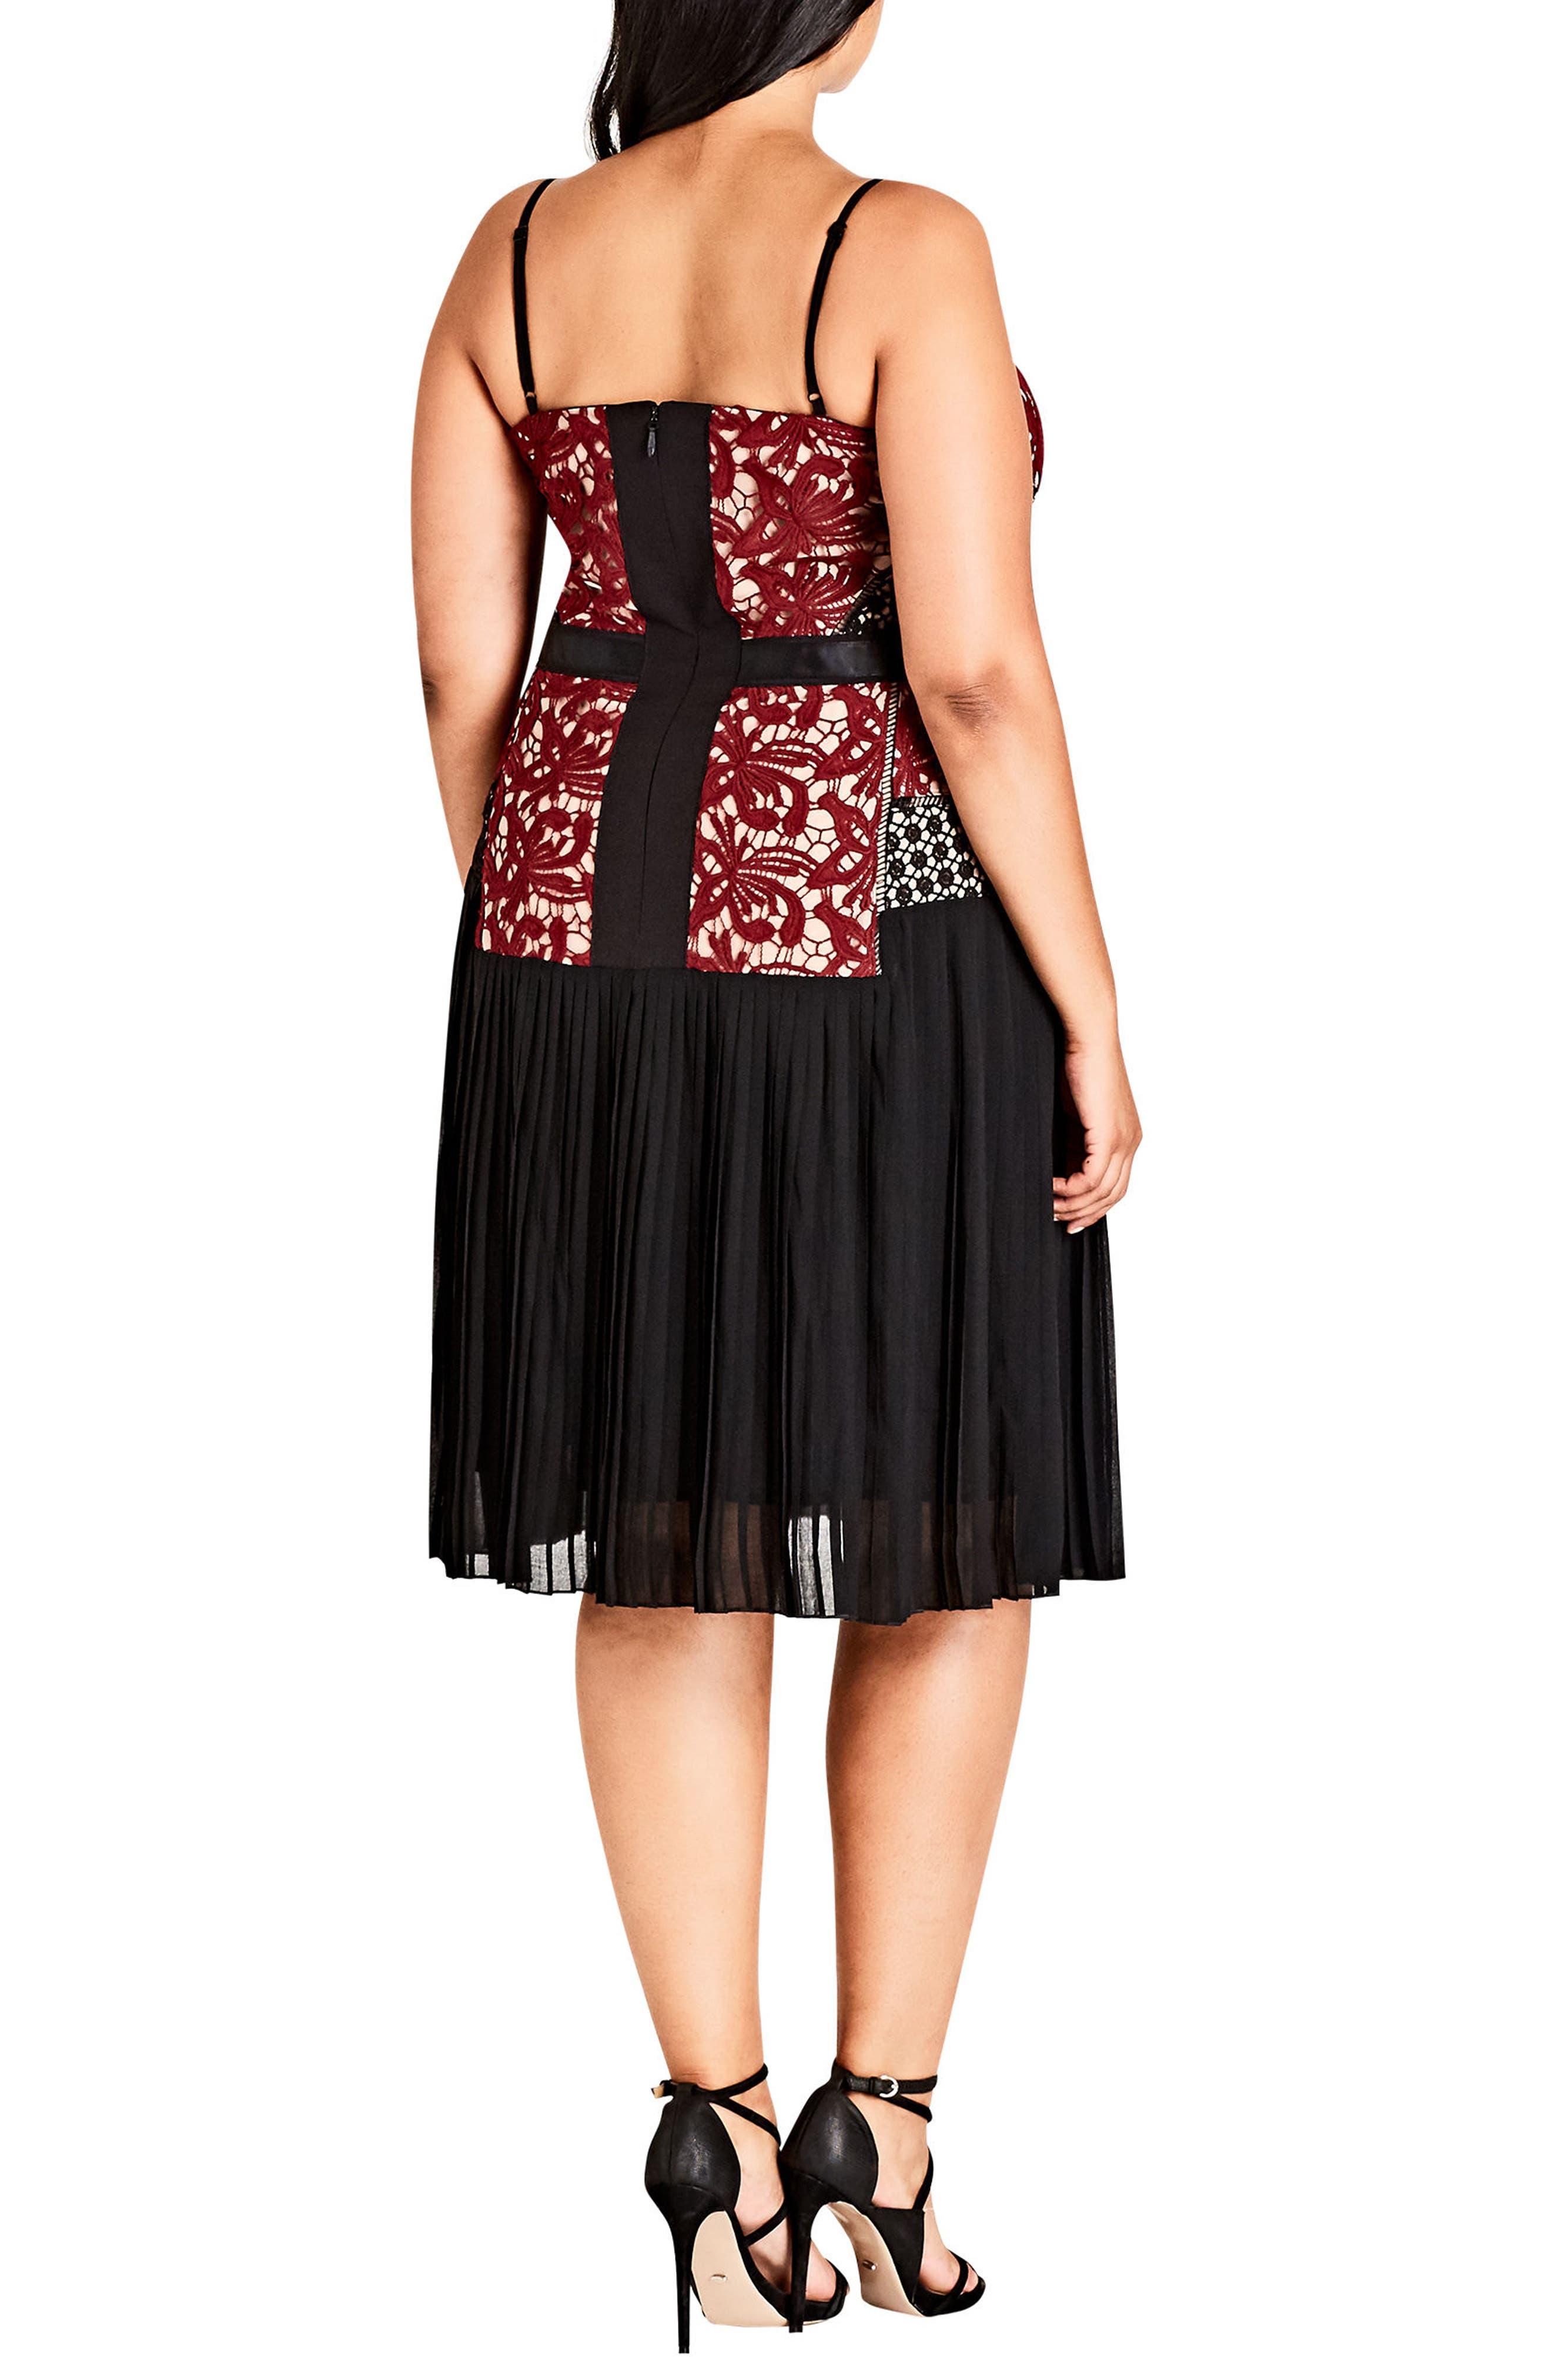 Obey Me Dress,                             Alternate thumbnail 2, color,                             001